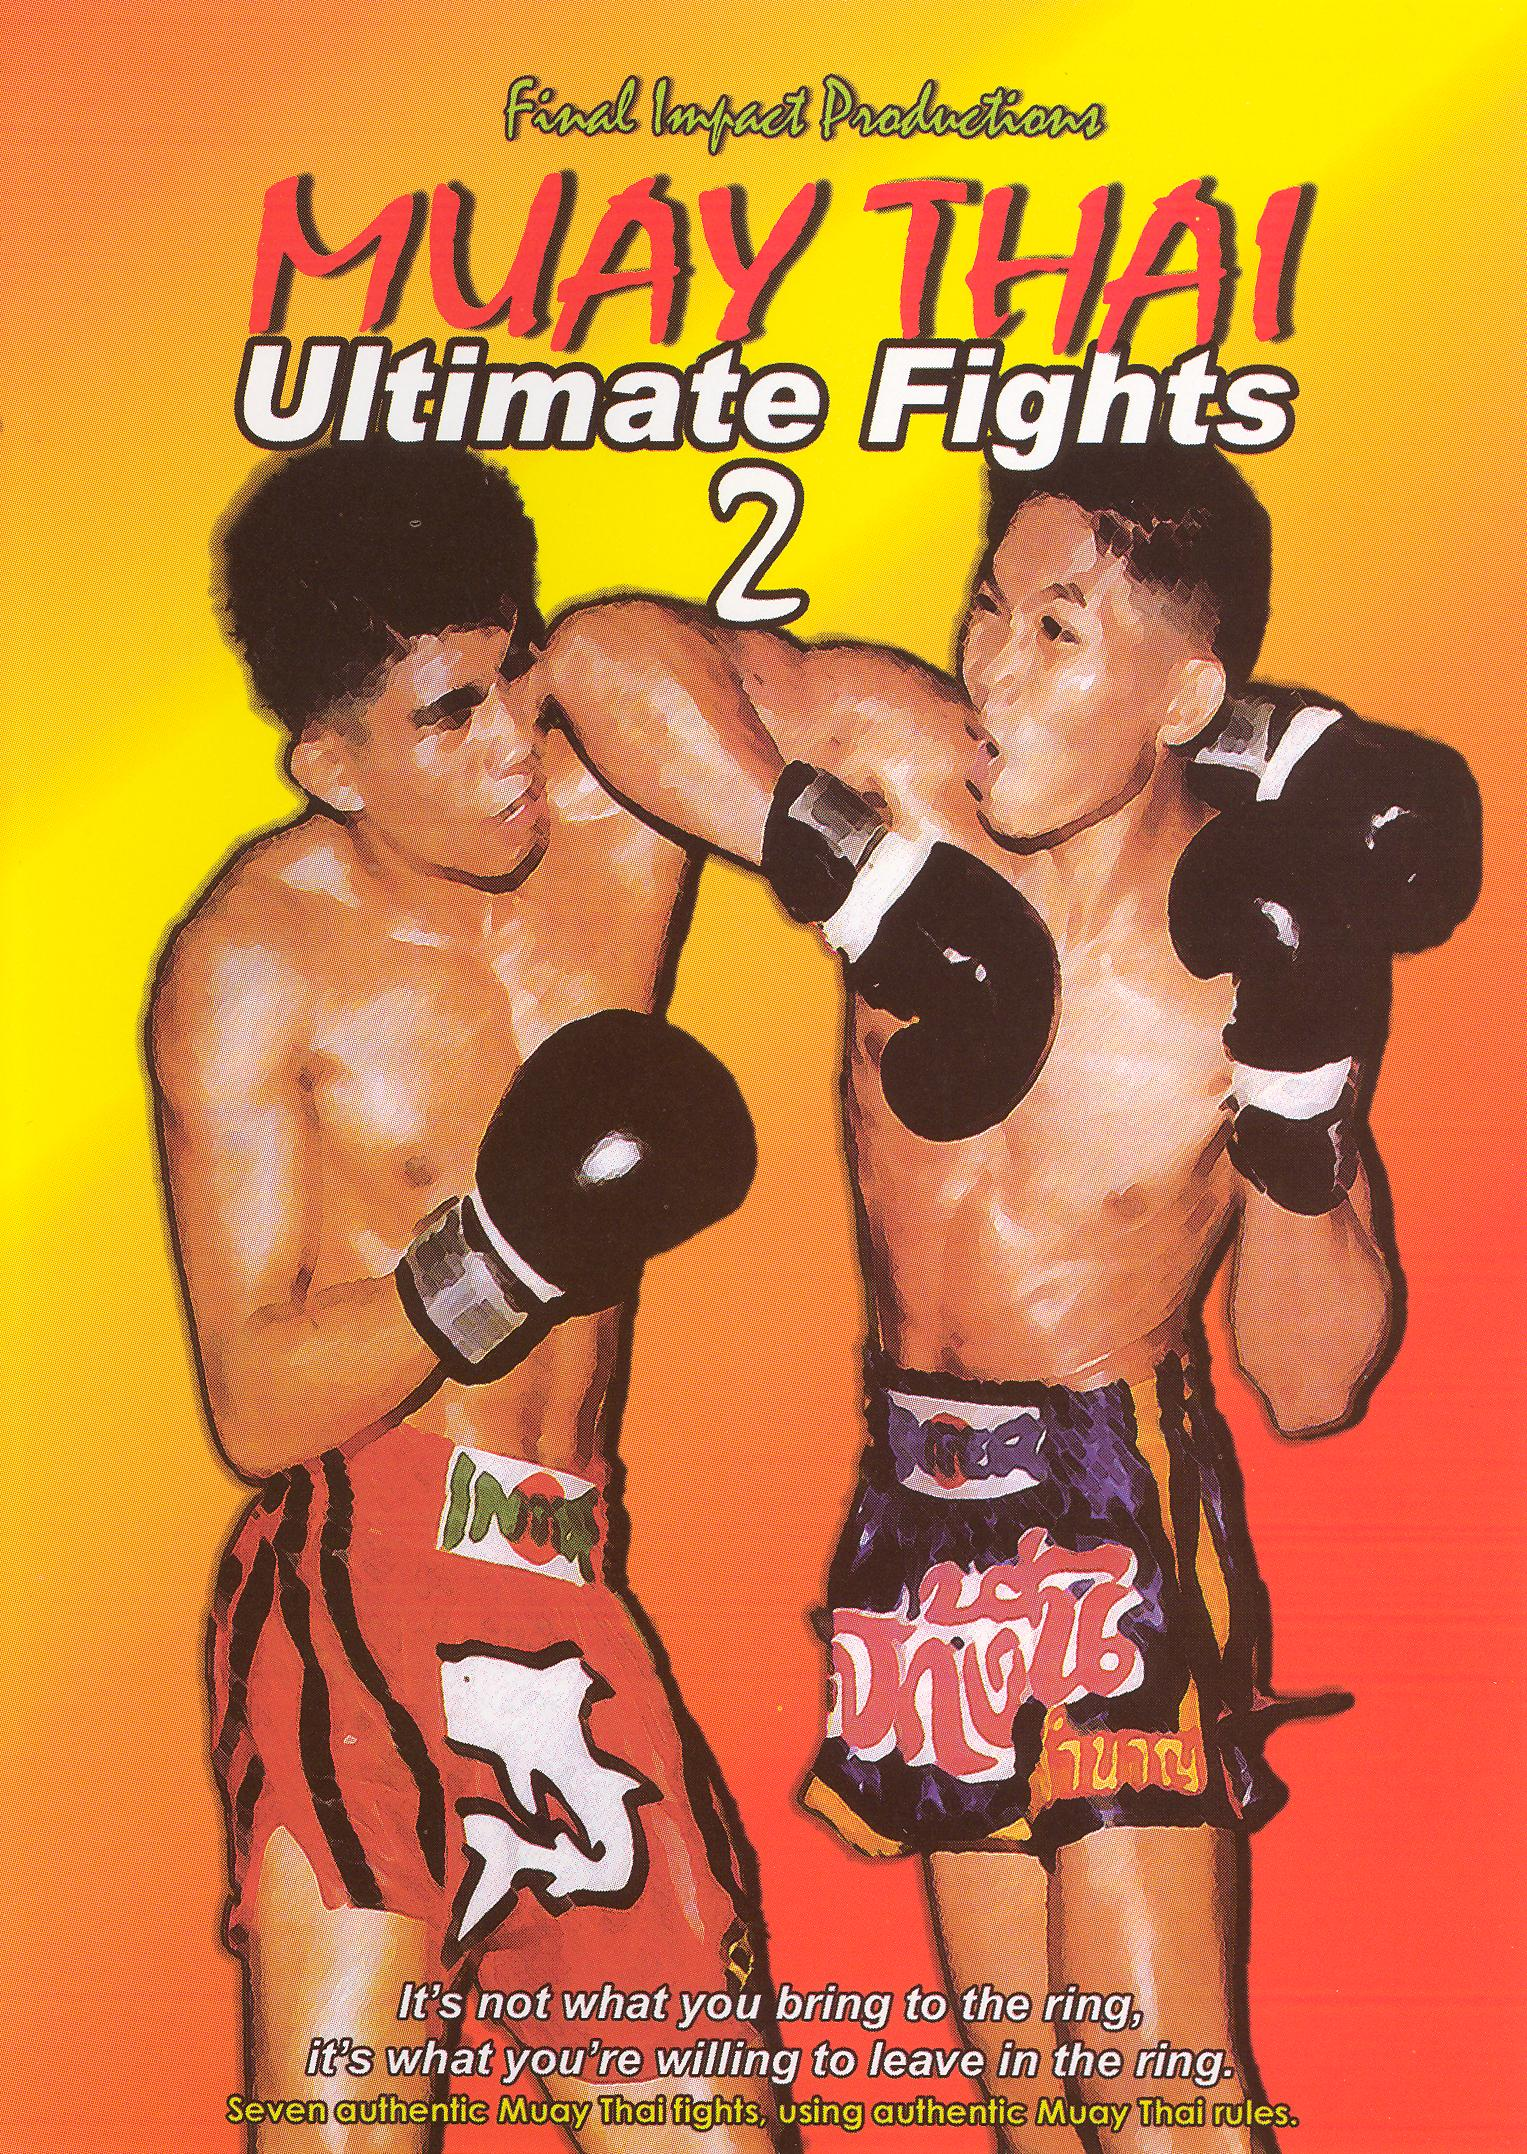 Muay Thai Ultimate Fights, Vol. 2